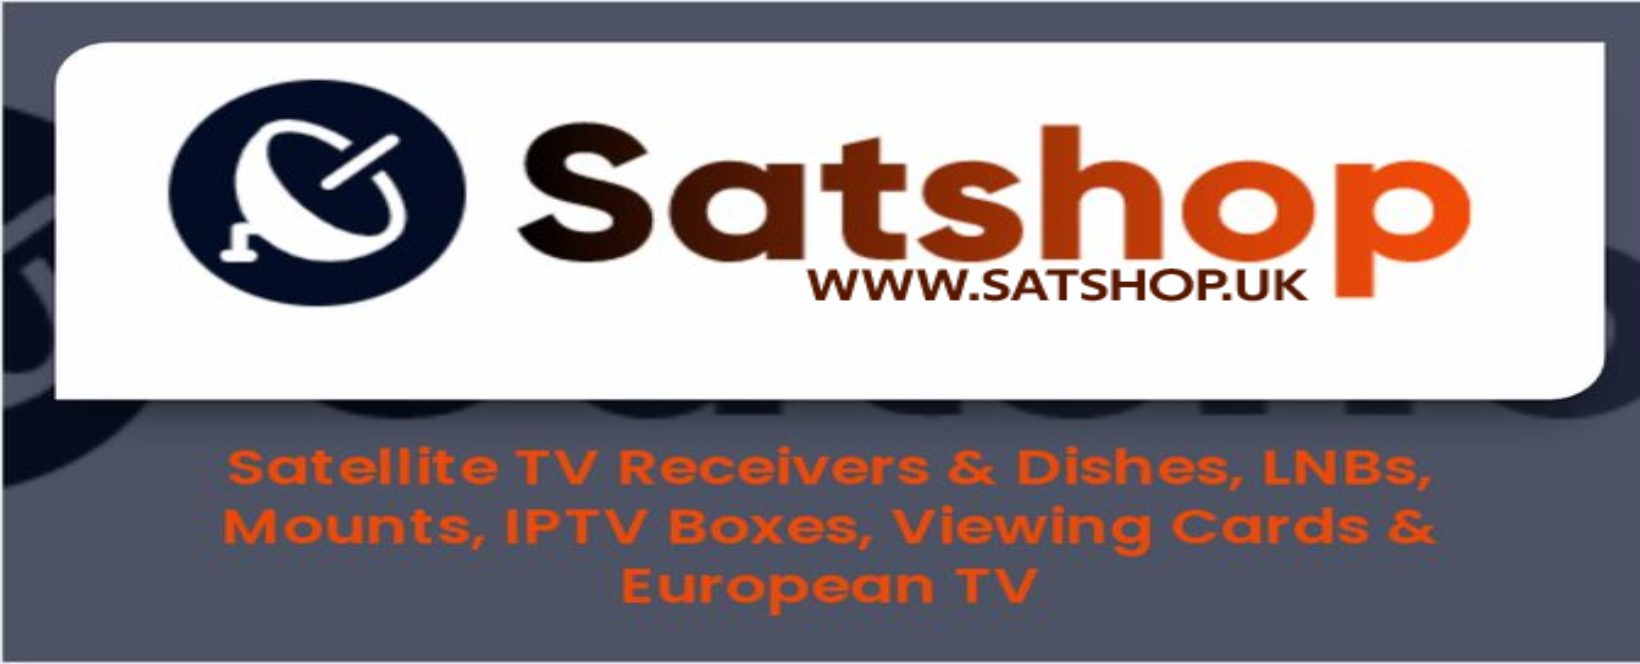 satshop satellite shop swansea kent sussex tunbridge wells